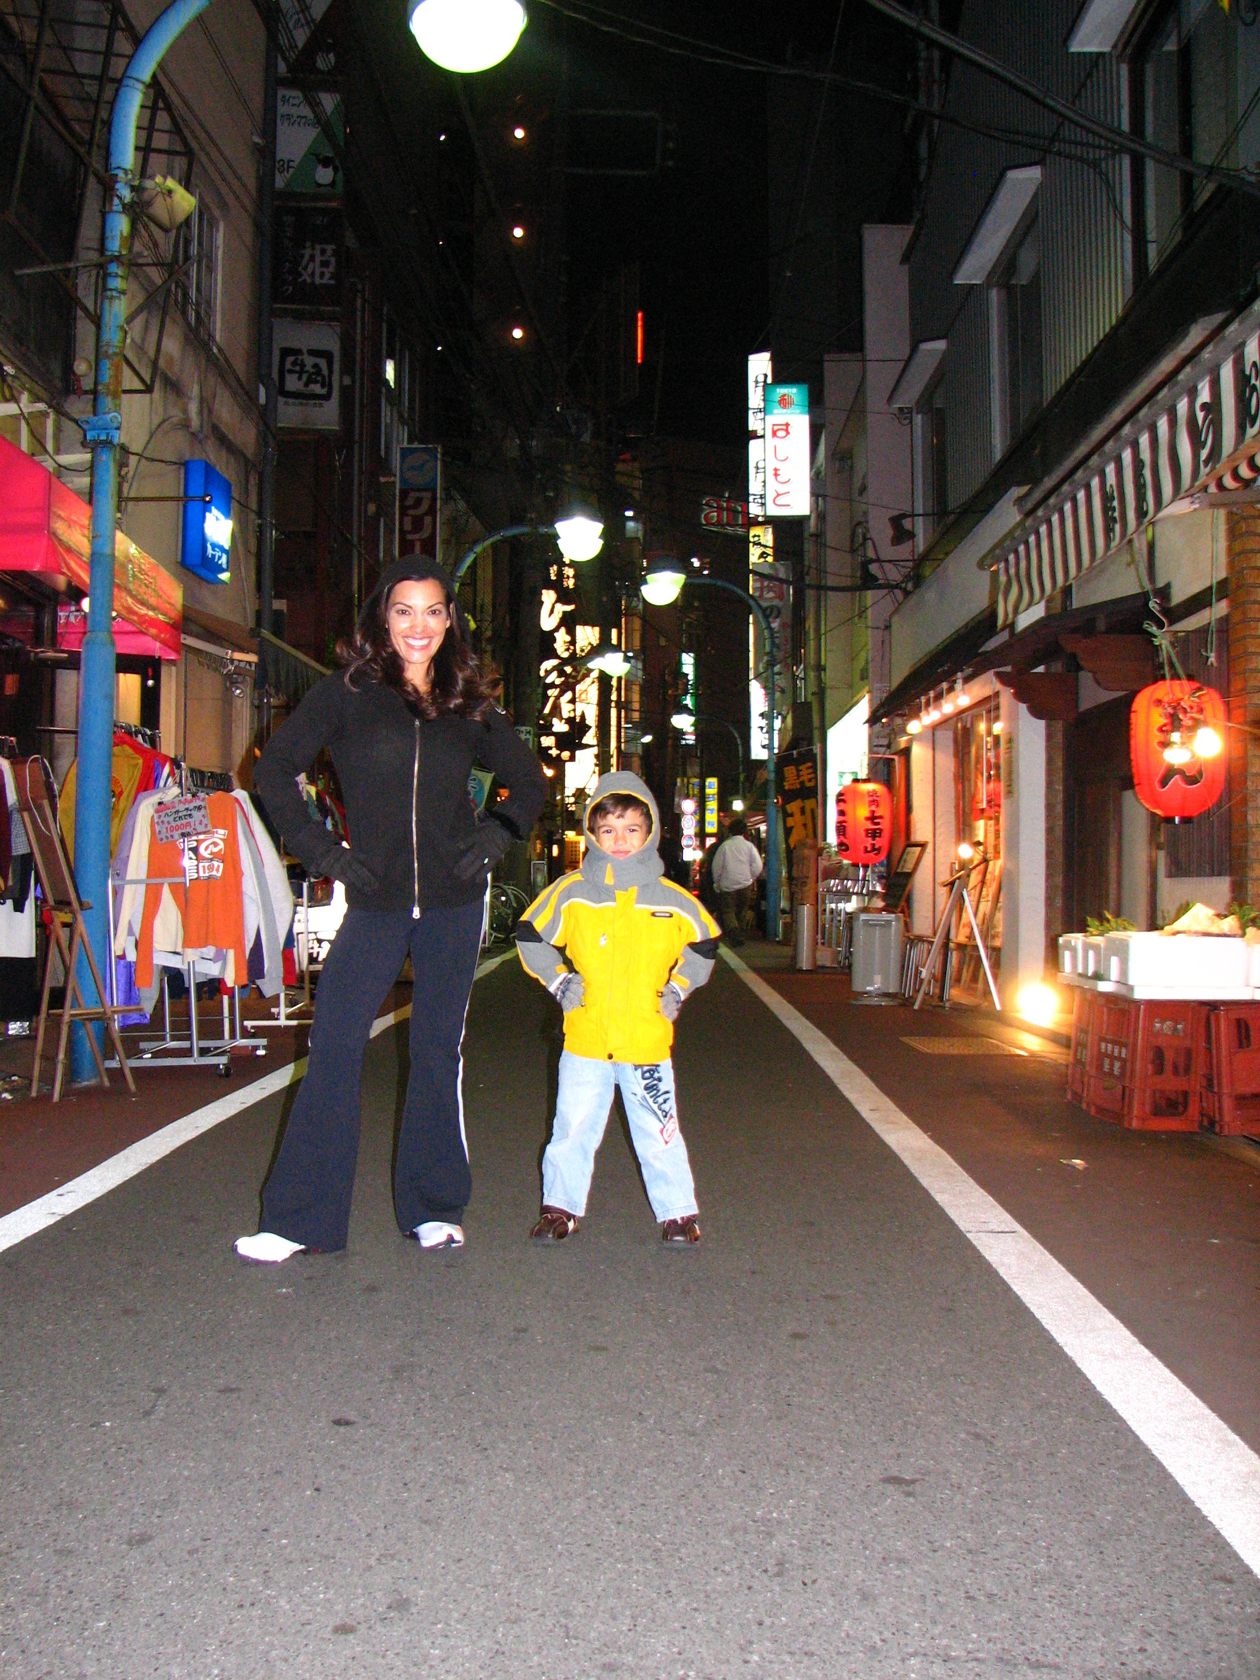 10_dec_2007_tokyo_street_ld_and_cat